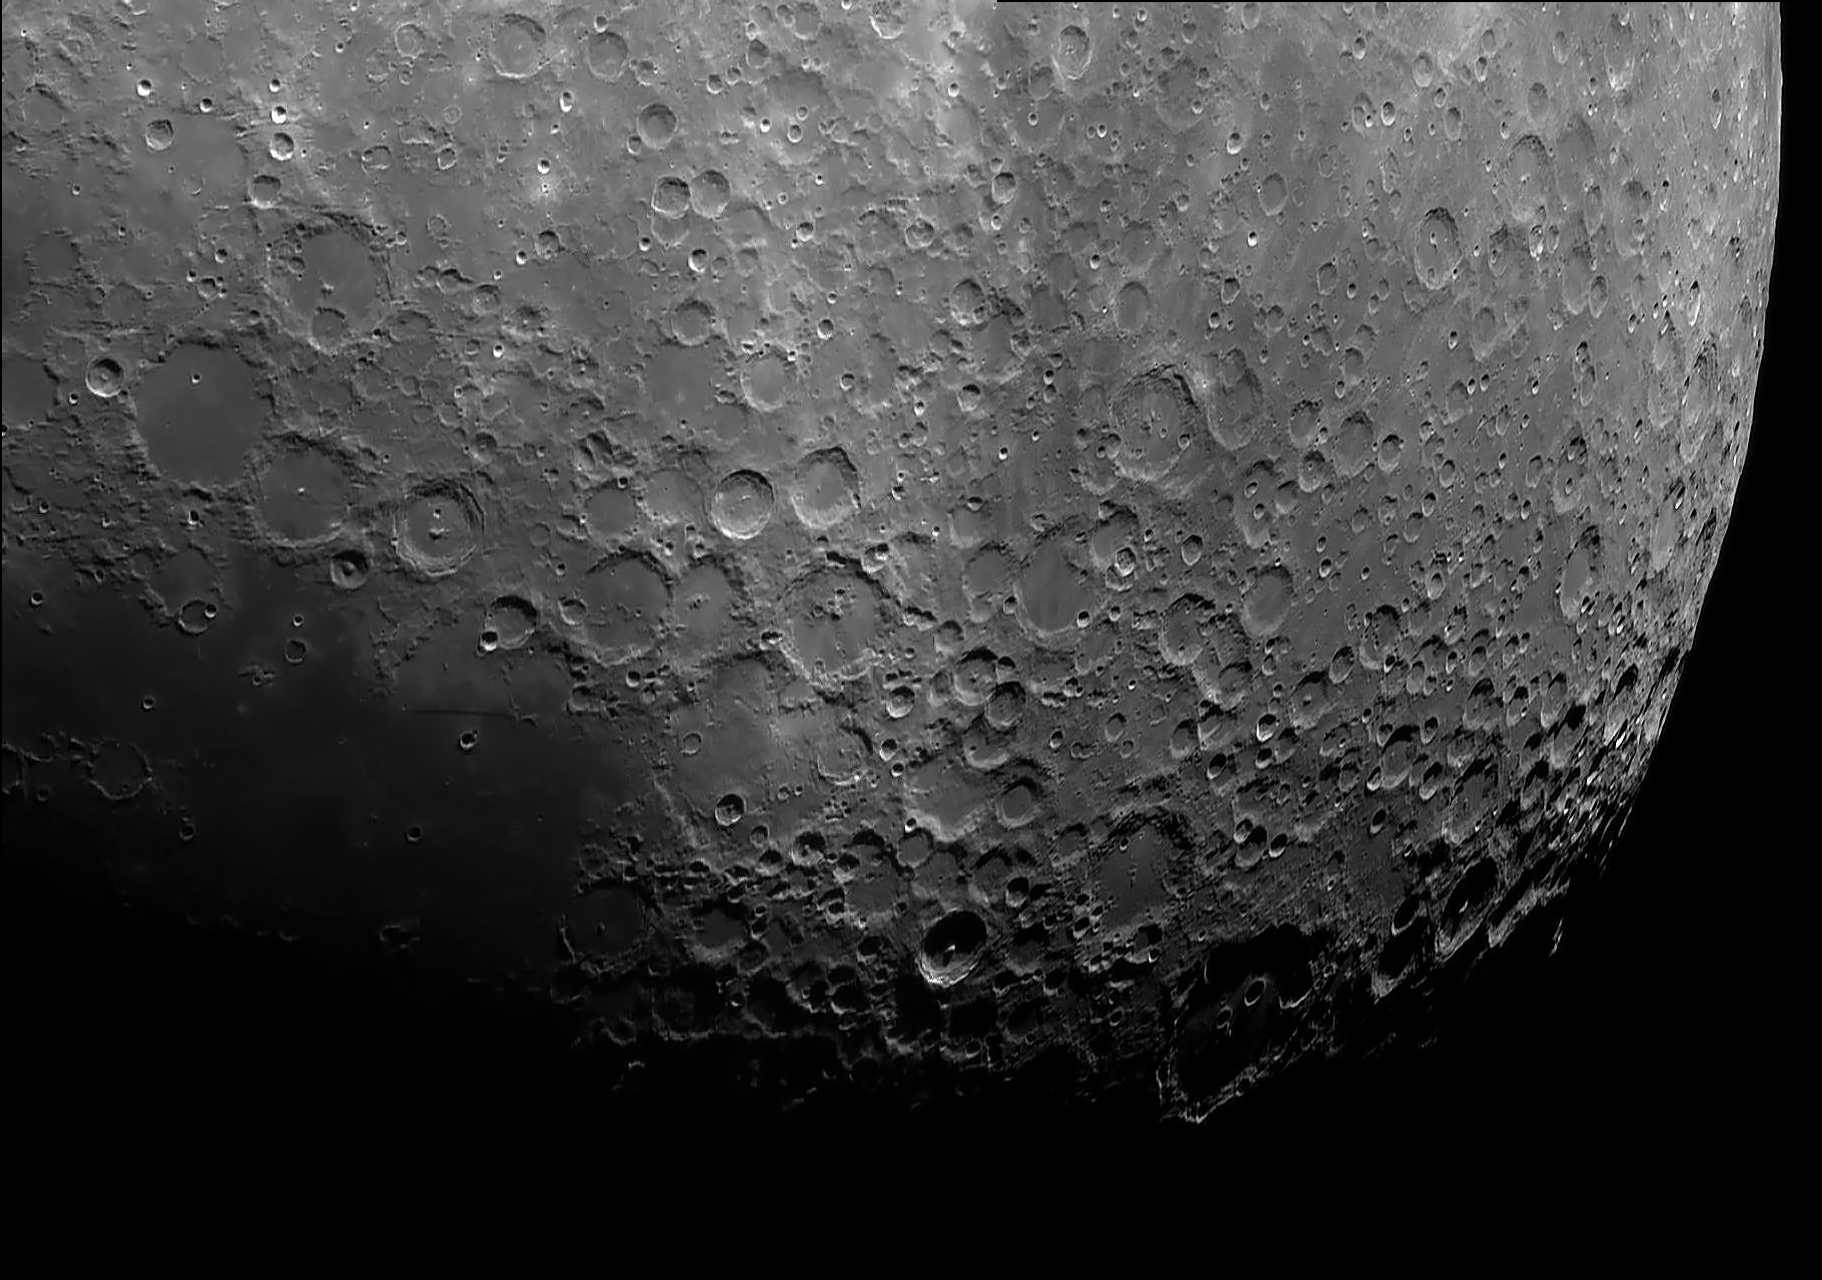 Sud de la Lune le 11 12 2013 Lune%202013%2012%2011_sud_1